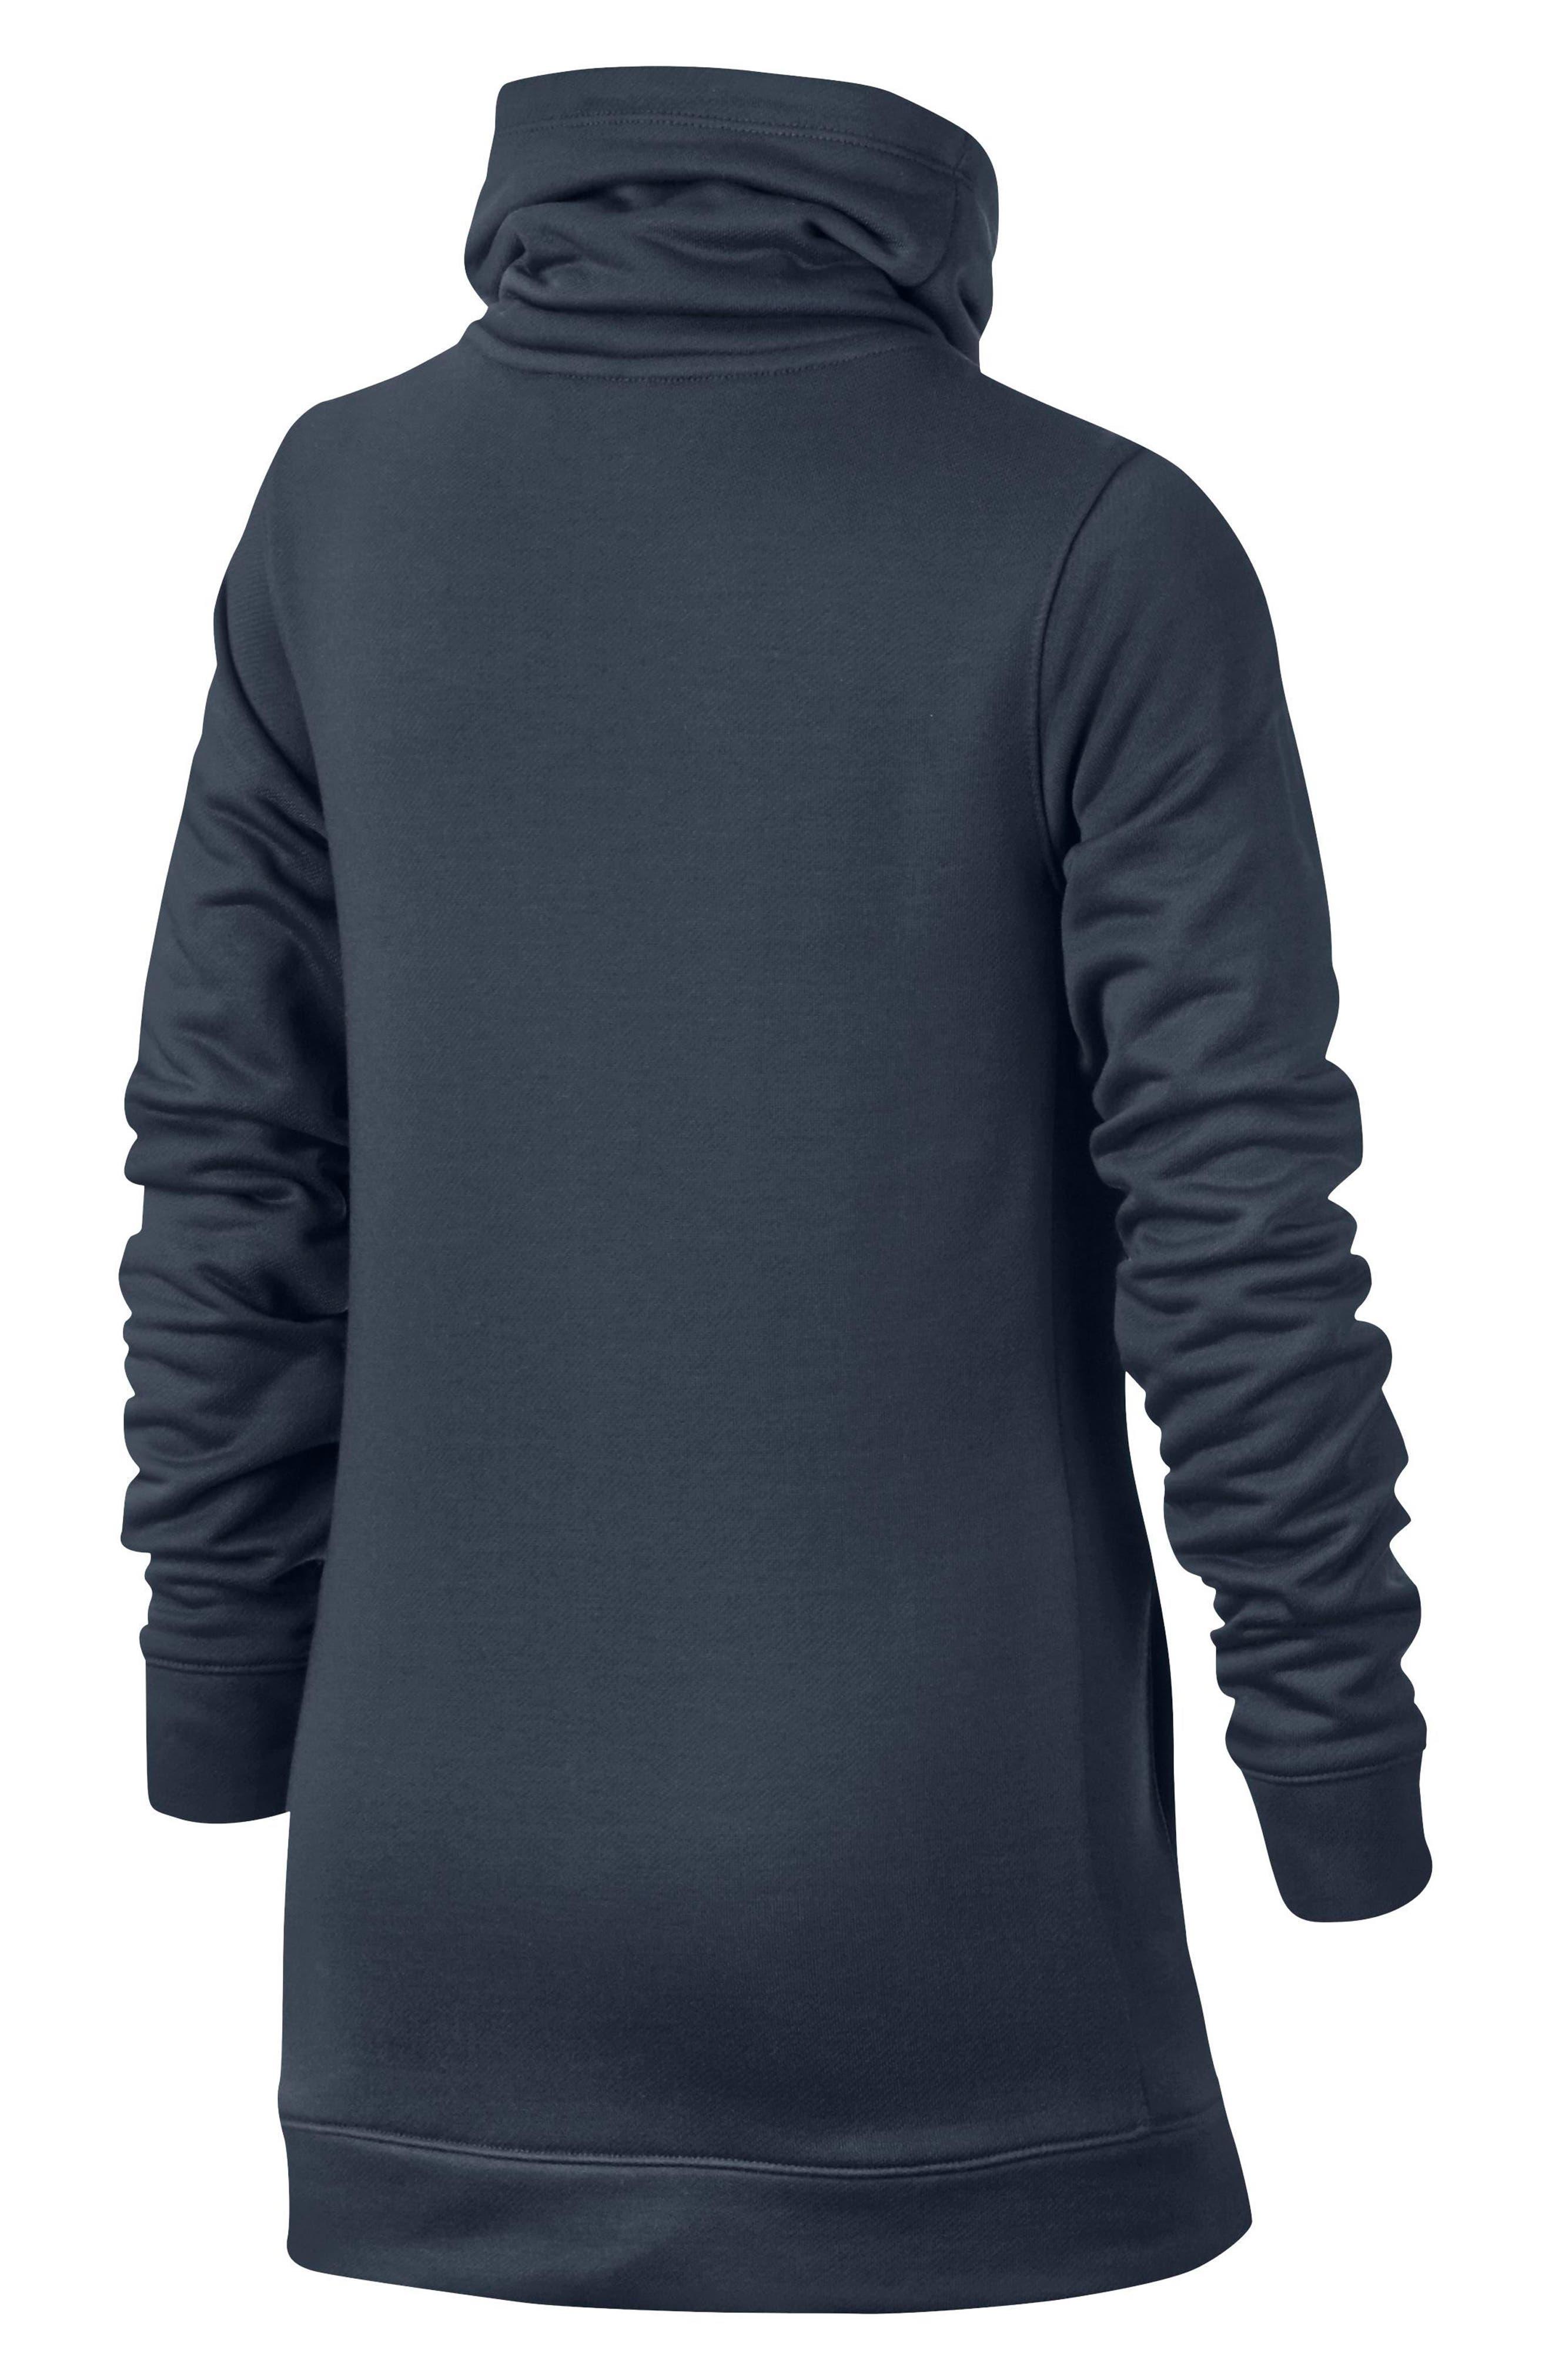 Dry Core Studio Long Sleeve Pullover,                             Alternate thumbnail 2, color,                             Thunder Blue/ Racer Pink